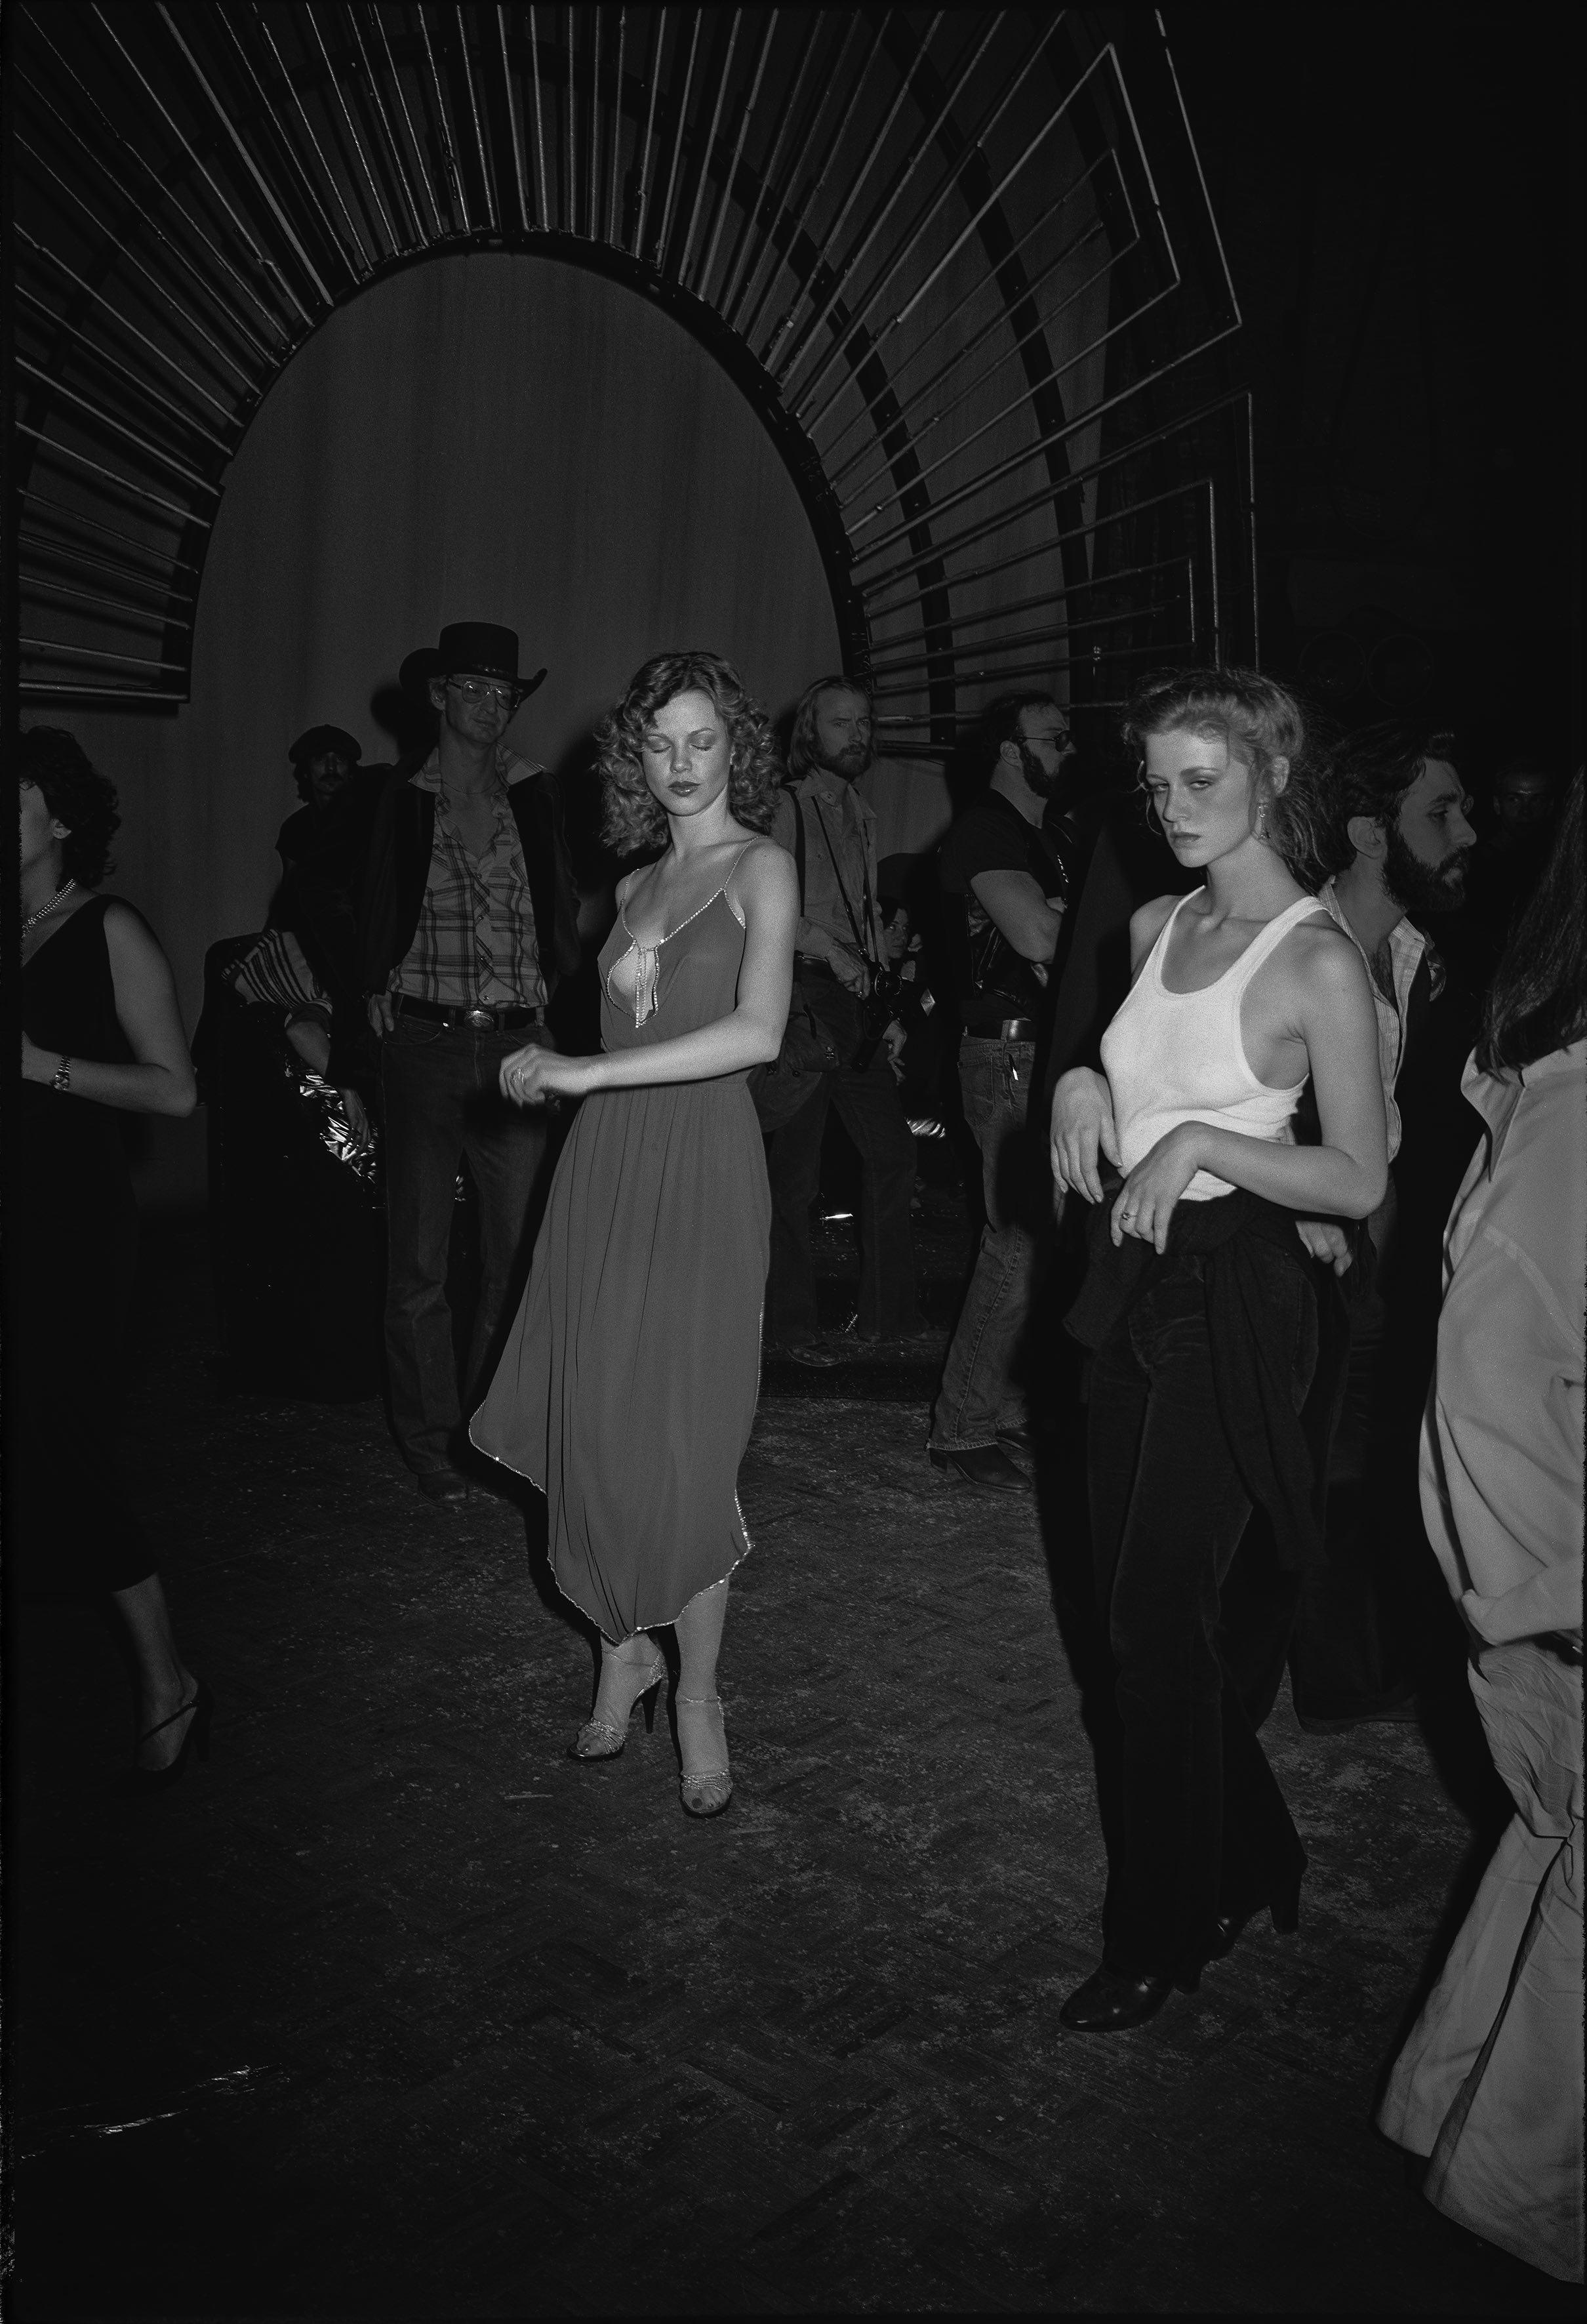 Fotó: Tod Papageorge: Studio 54, New York, 1978-80. Colección Per Amor a l'Art © Tod Papageorge / VEGAP, València, 2021